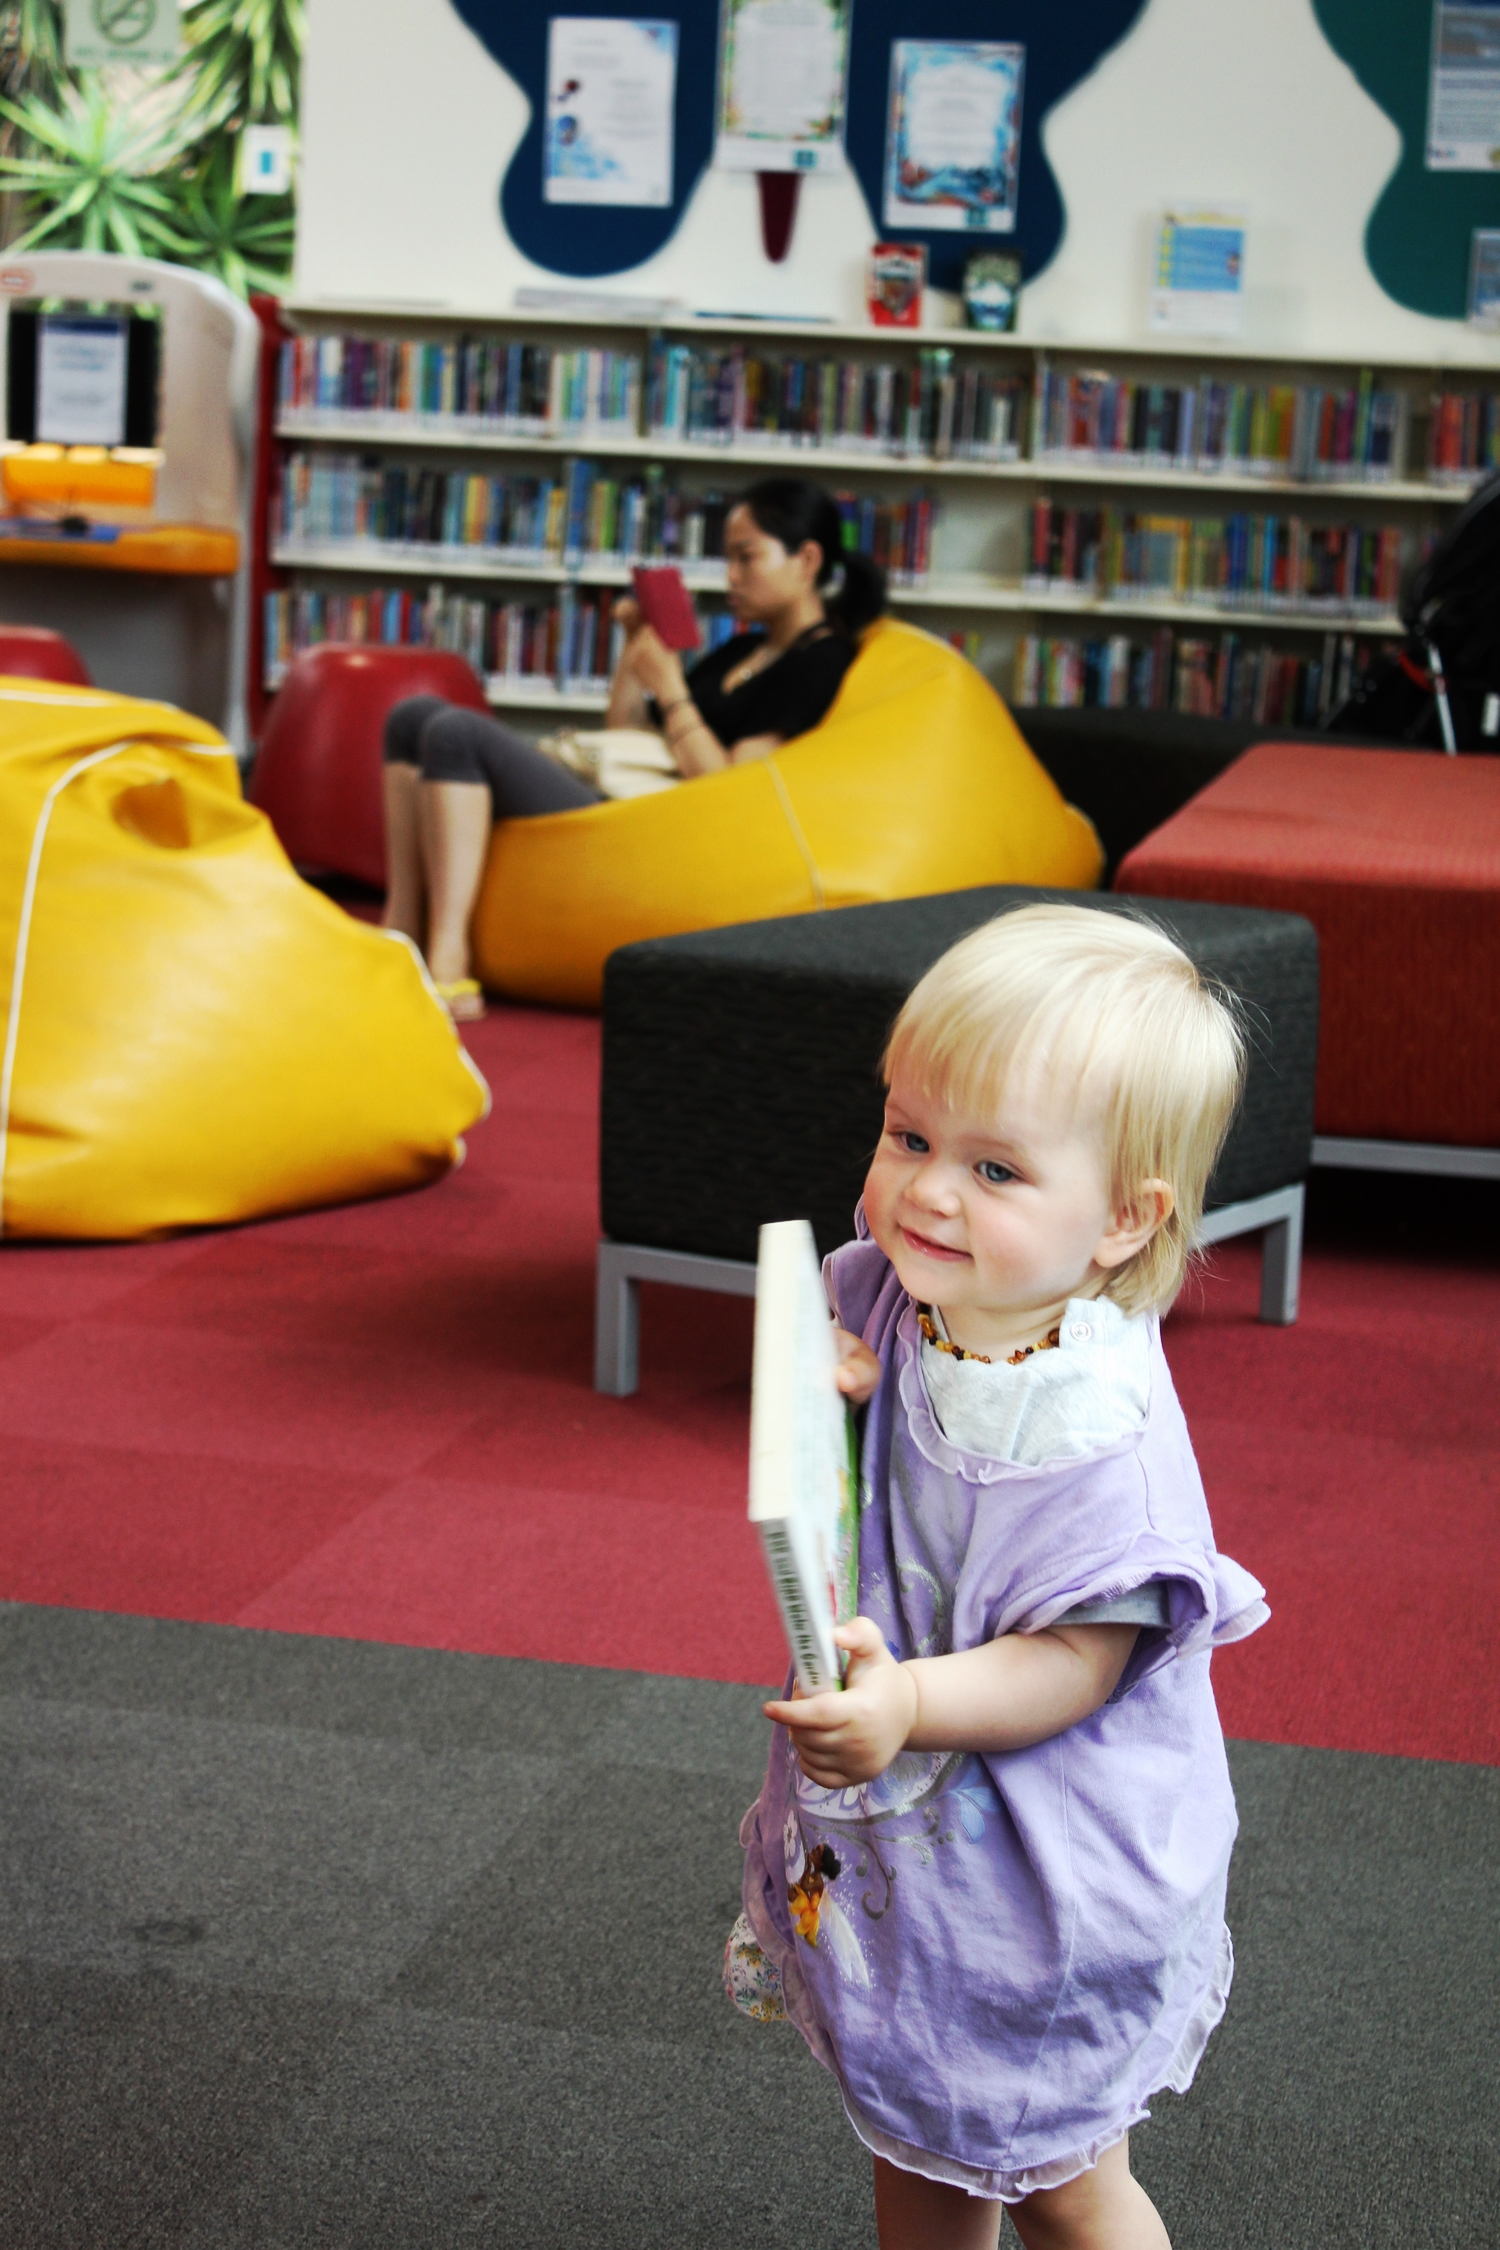 altona meadows library, altona meadows - Mamma Knows West